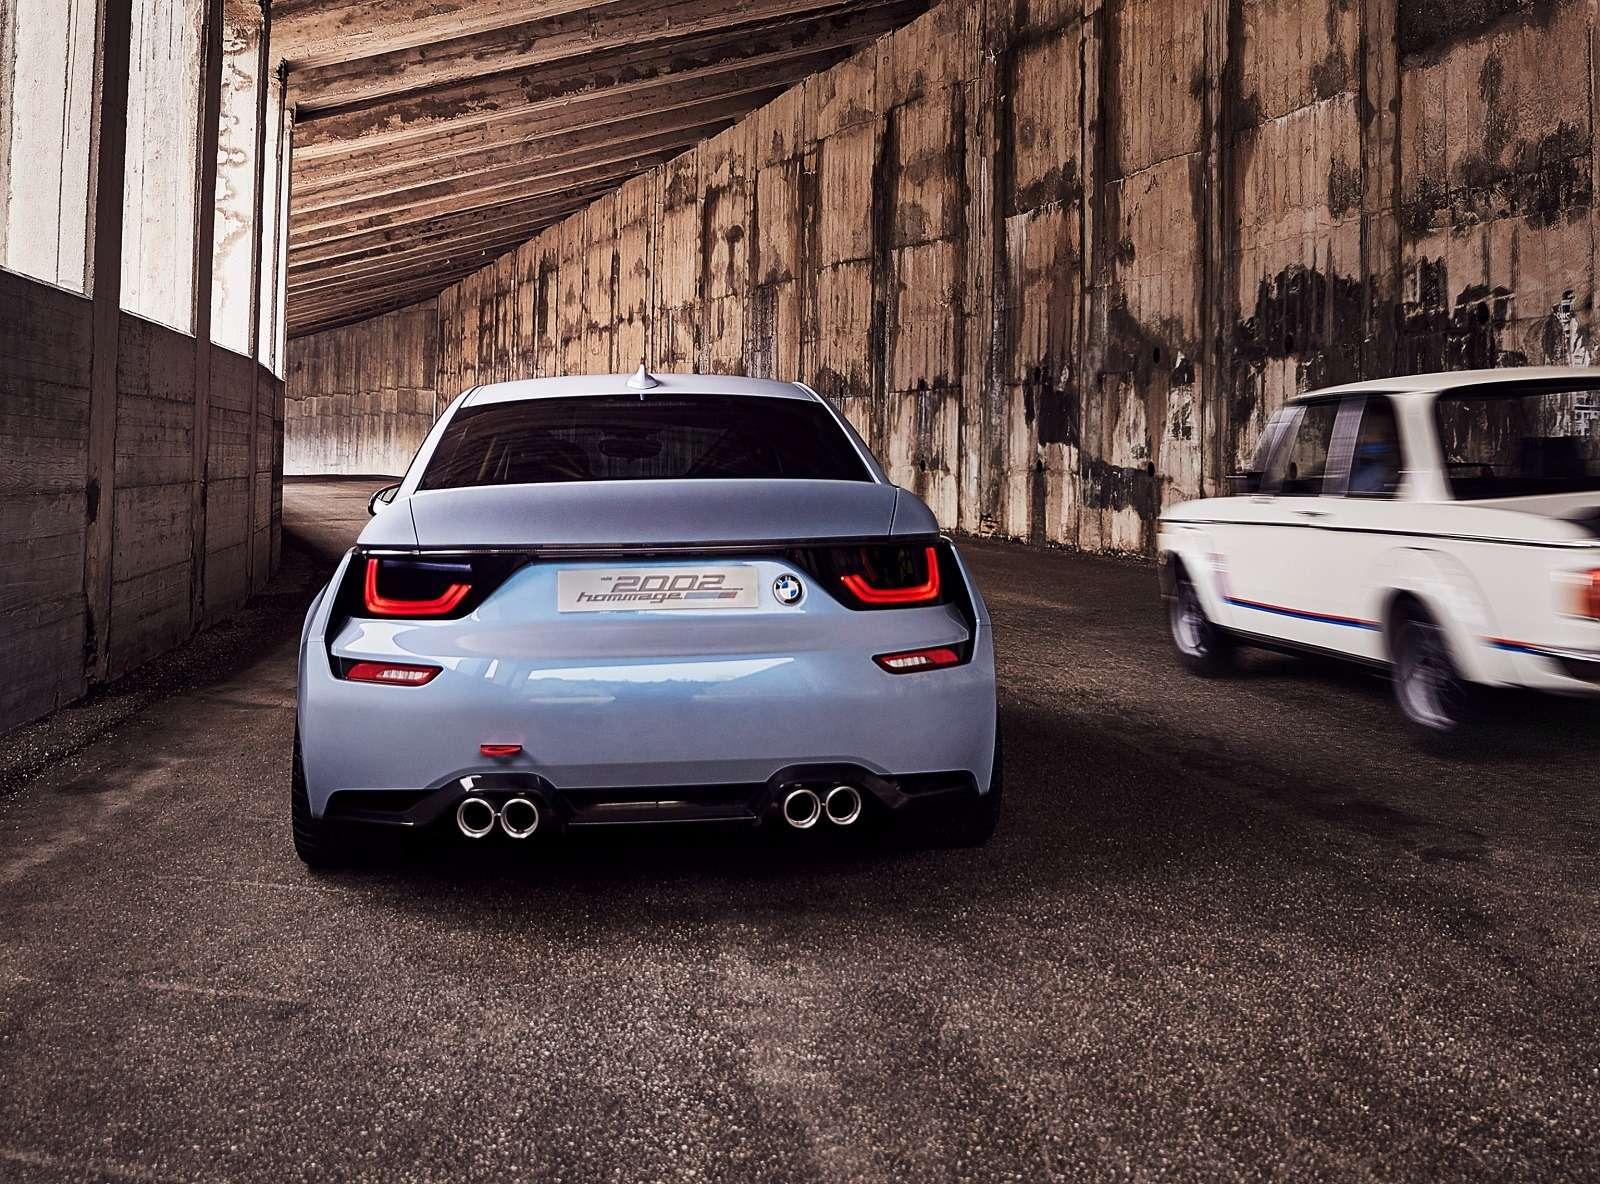 Иллюзия легенды: BMW поупражнялась натему 2002 turbo— фото 590513